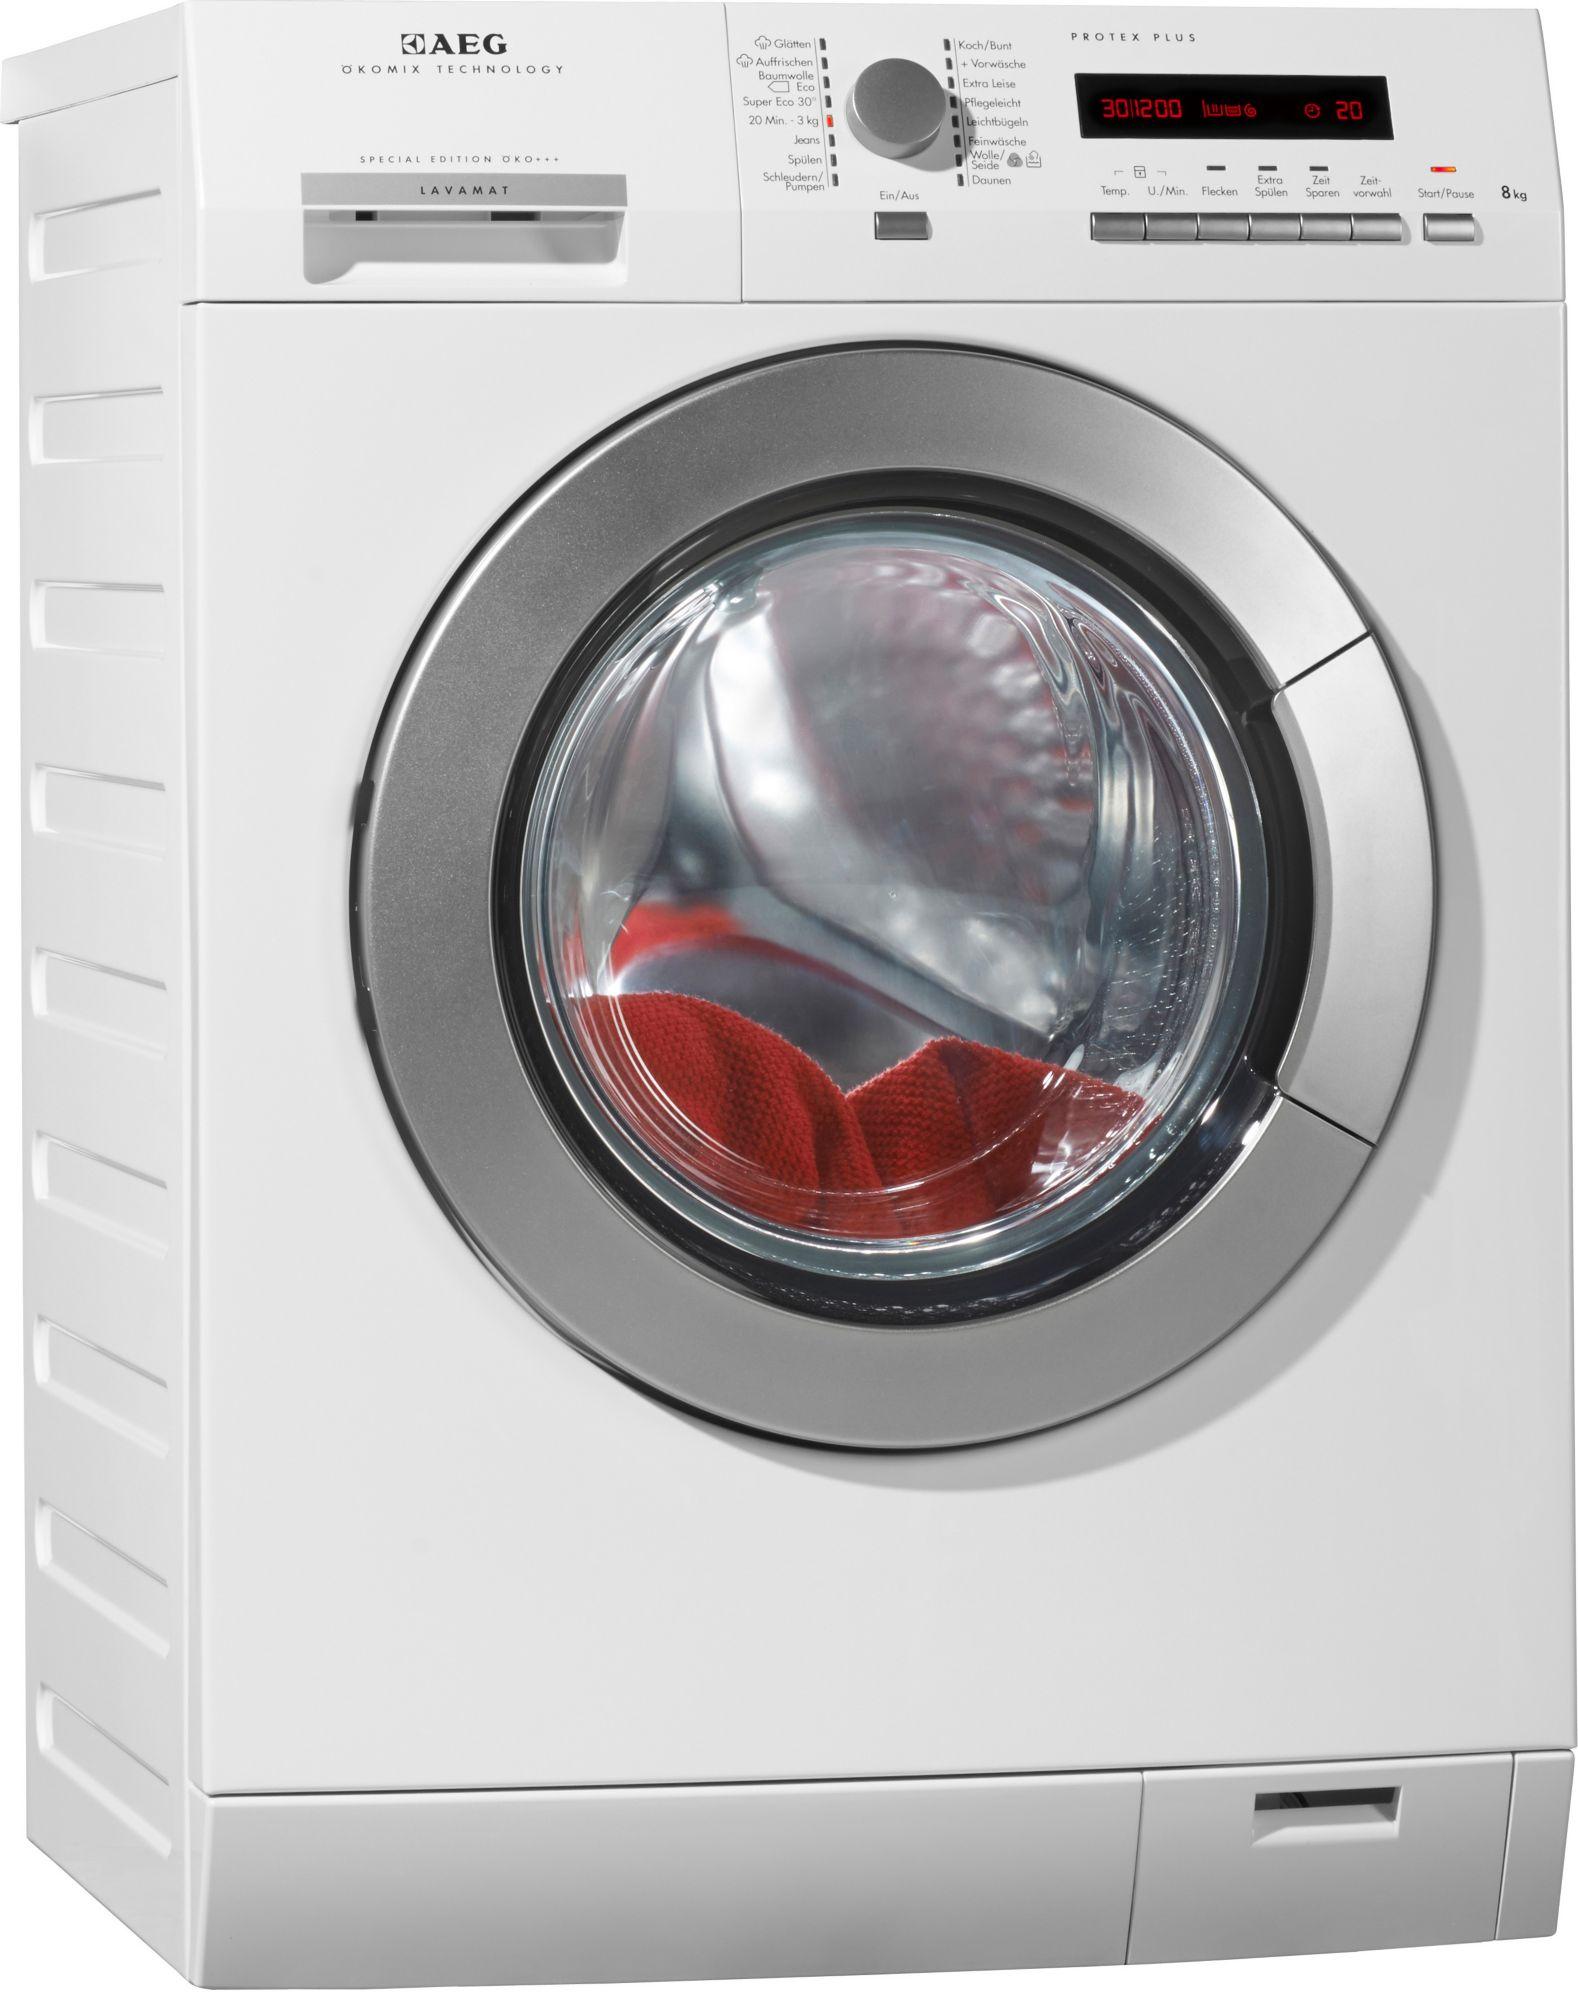 aeg waschmaschine lavamat l ko fl a 8 kg 1400 u. Black Bedroom Furniture Sets. Home Design Ideas